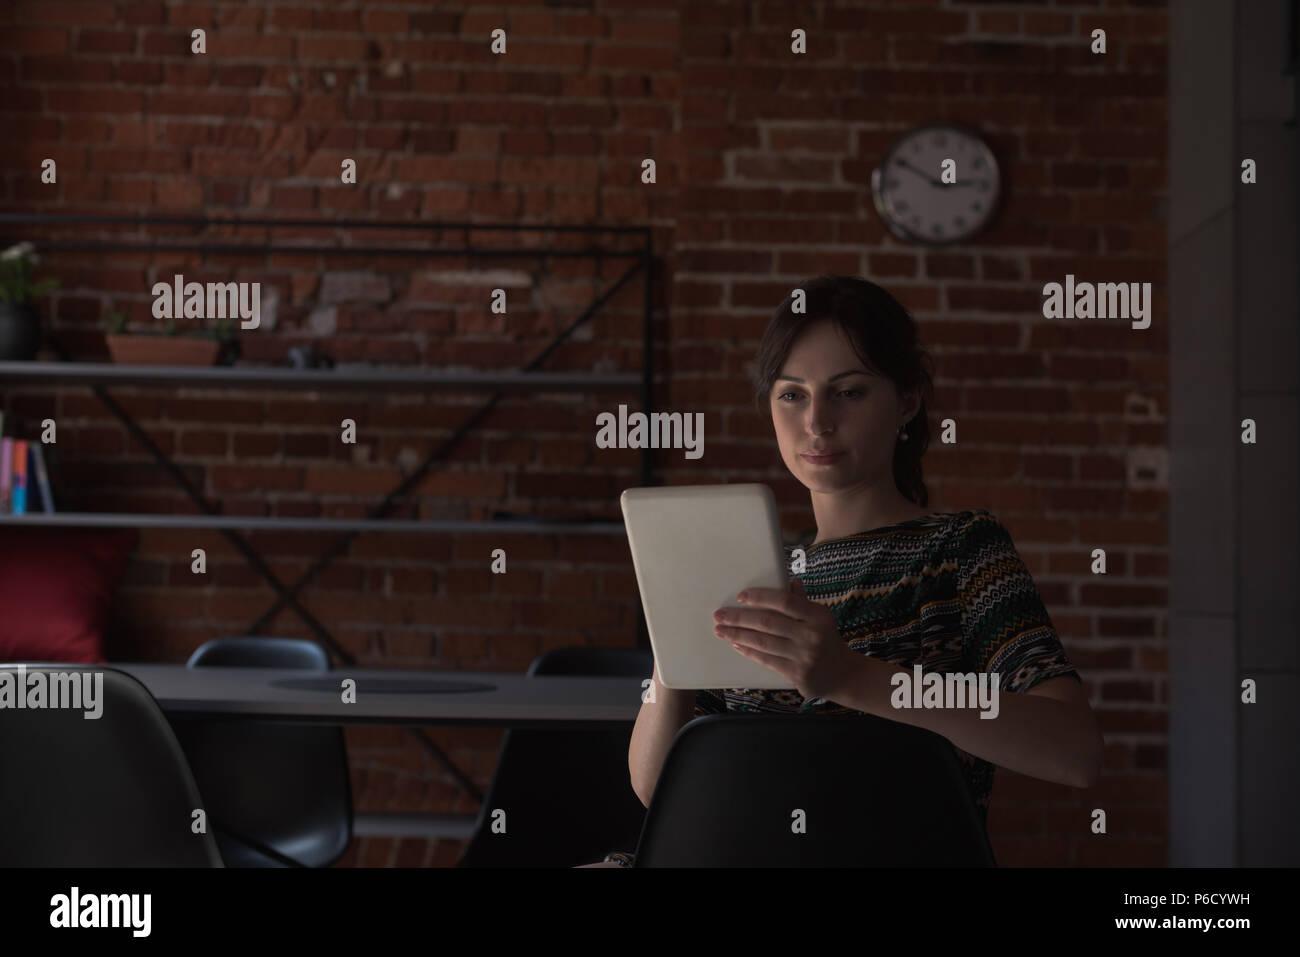 Female executive using digital tablet Banque D'Images